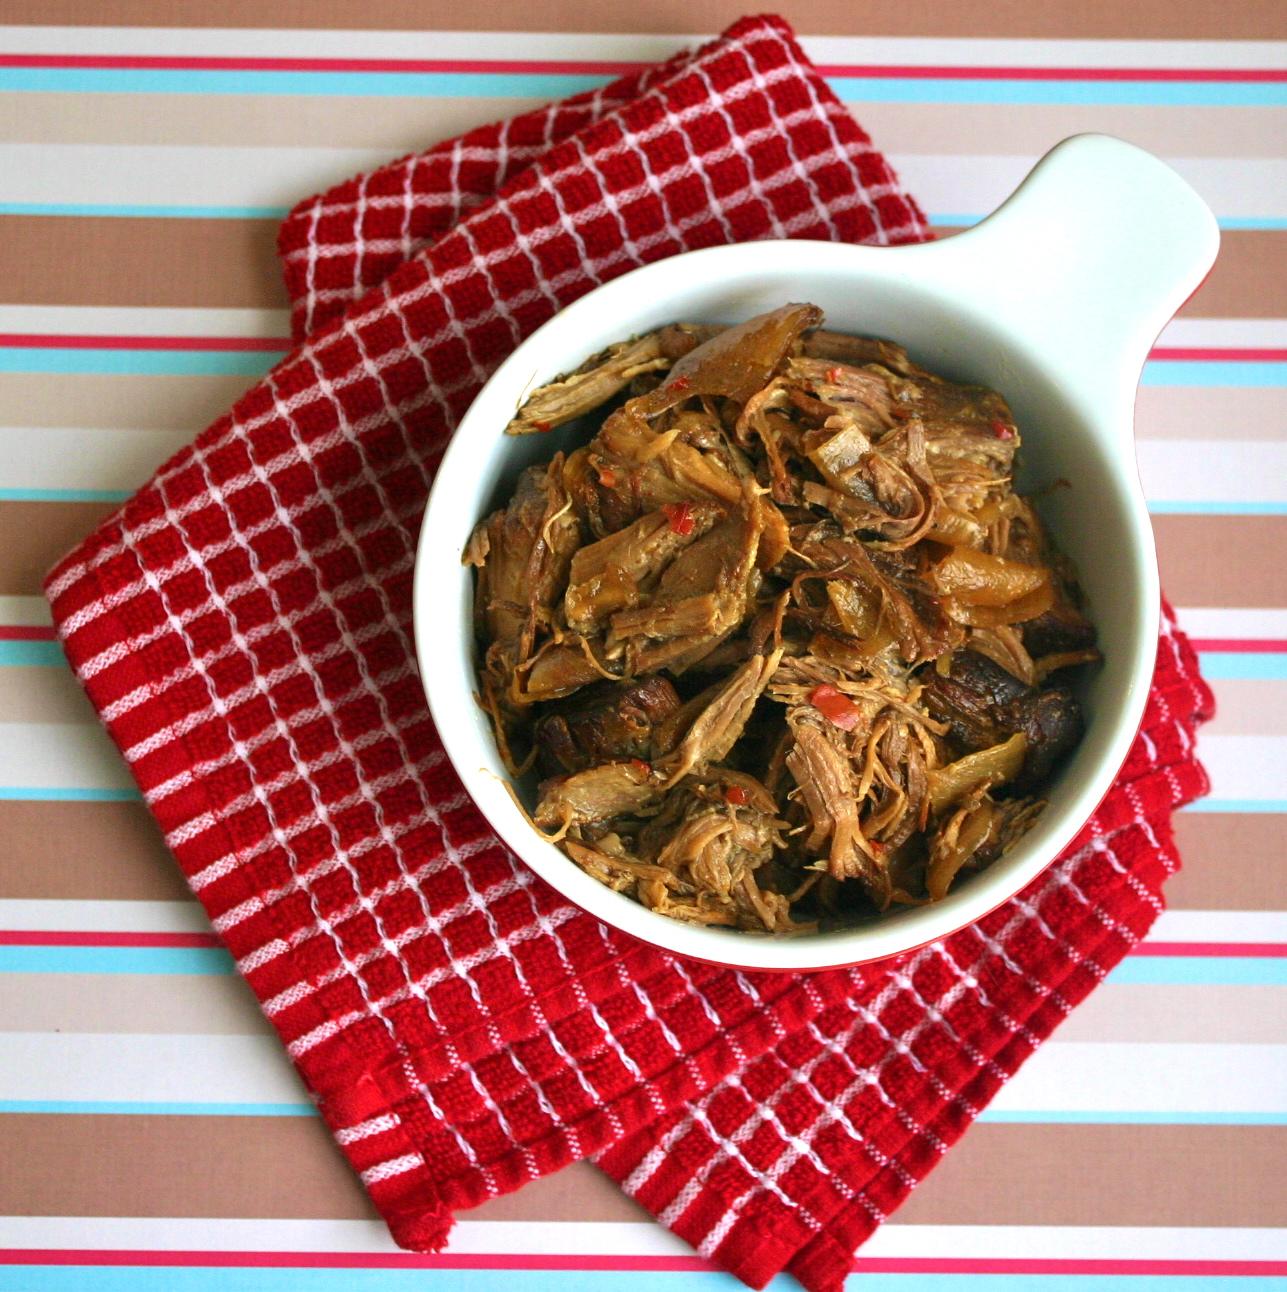 My Retro Kitchen: Hot Pepper Jelly Pork Shoulder in the